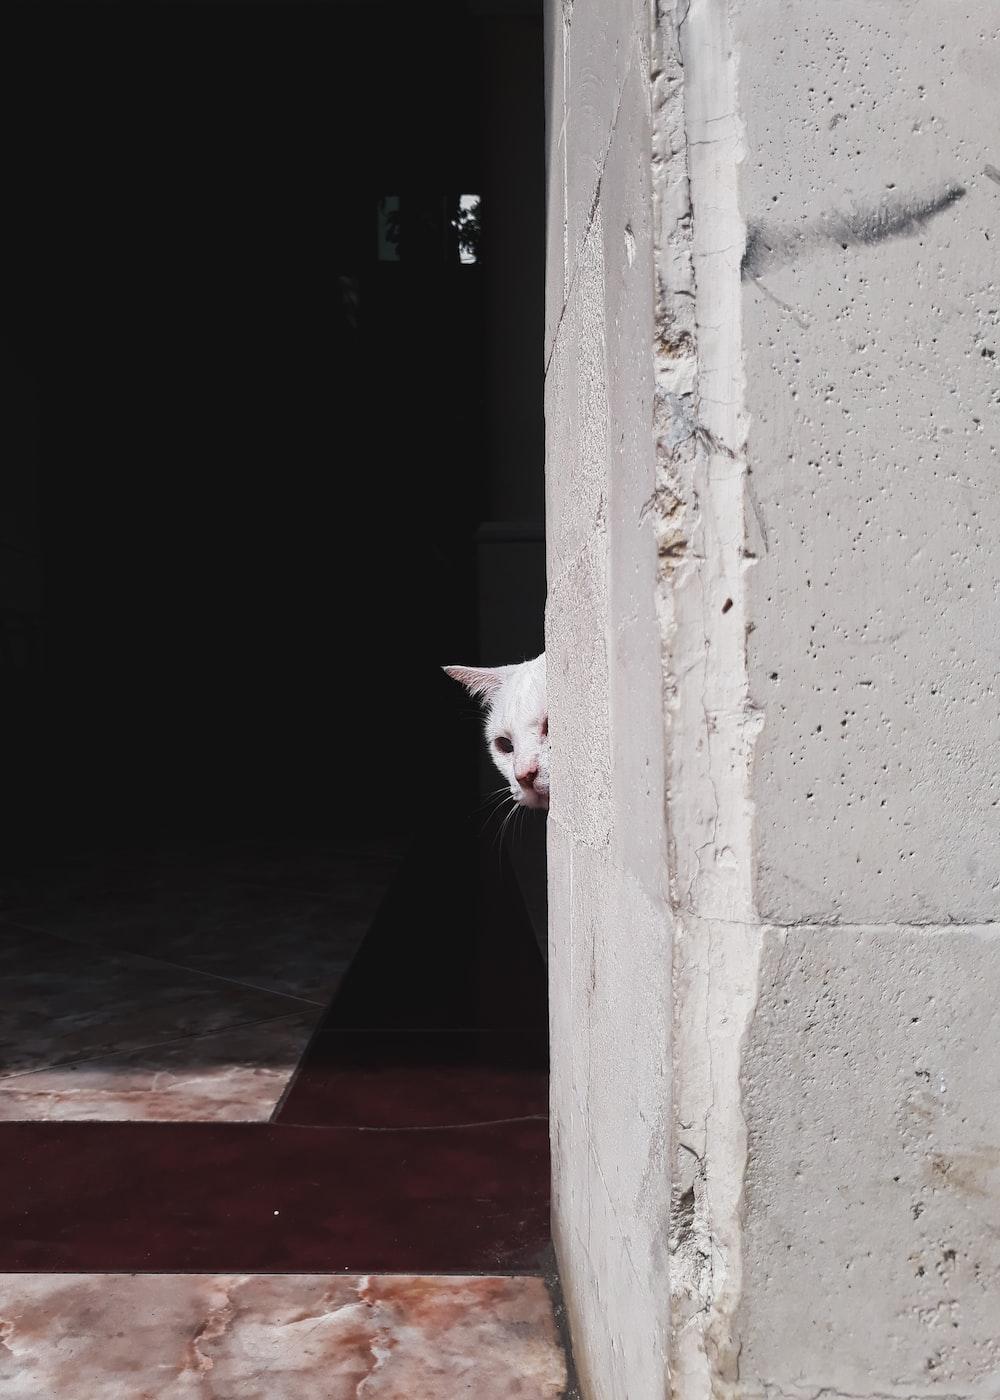 white cat beside wall